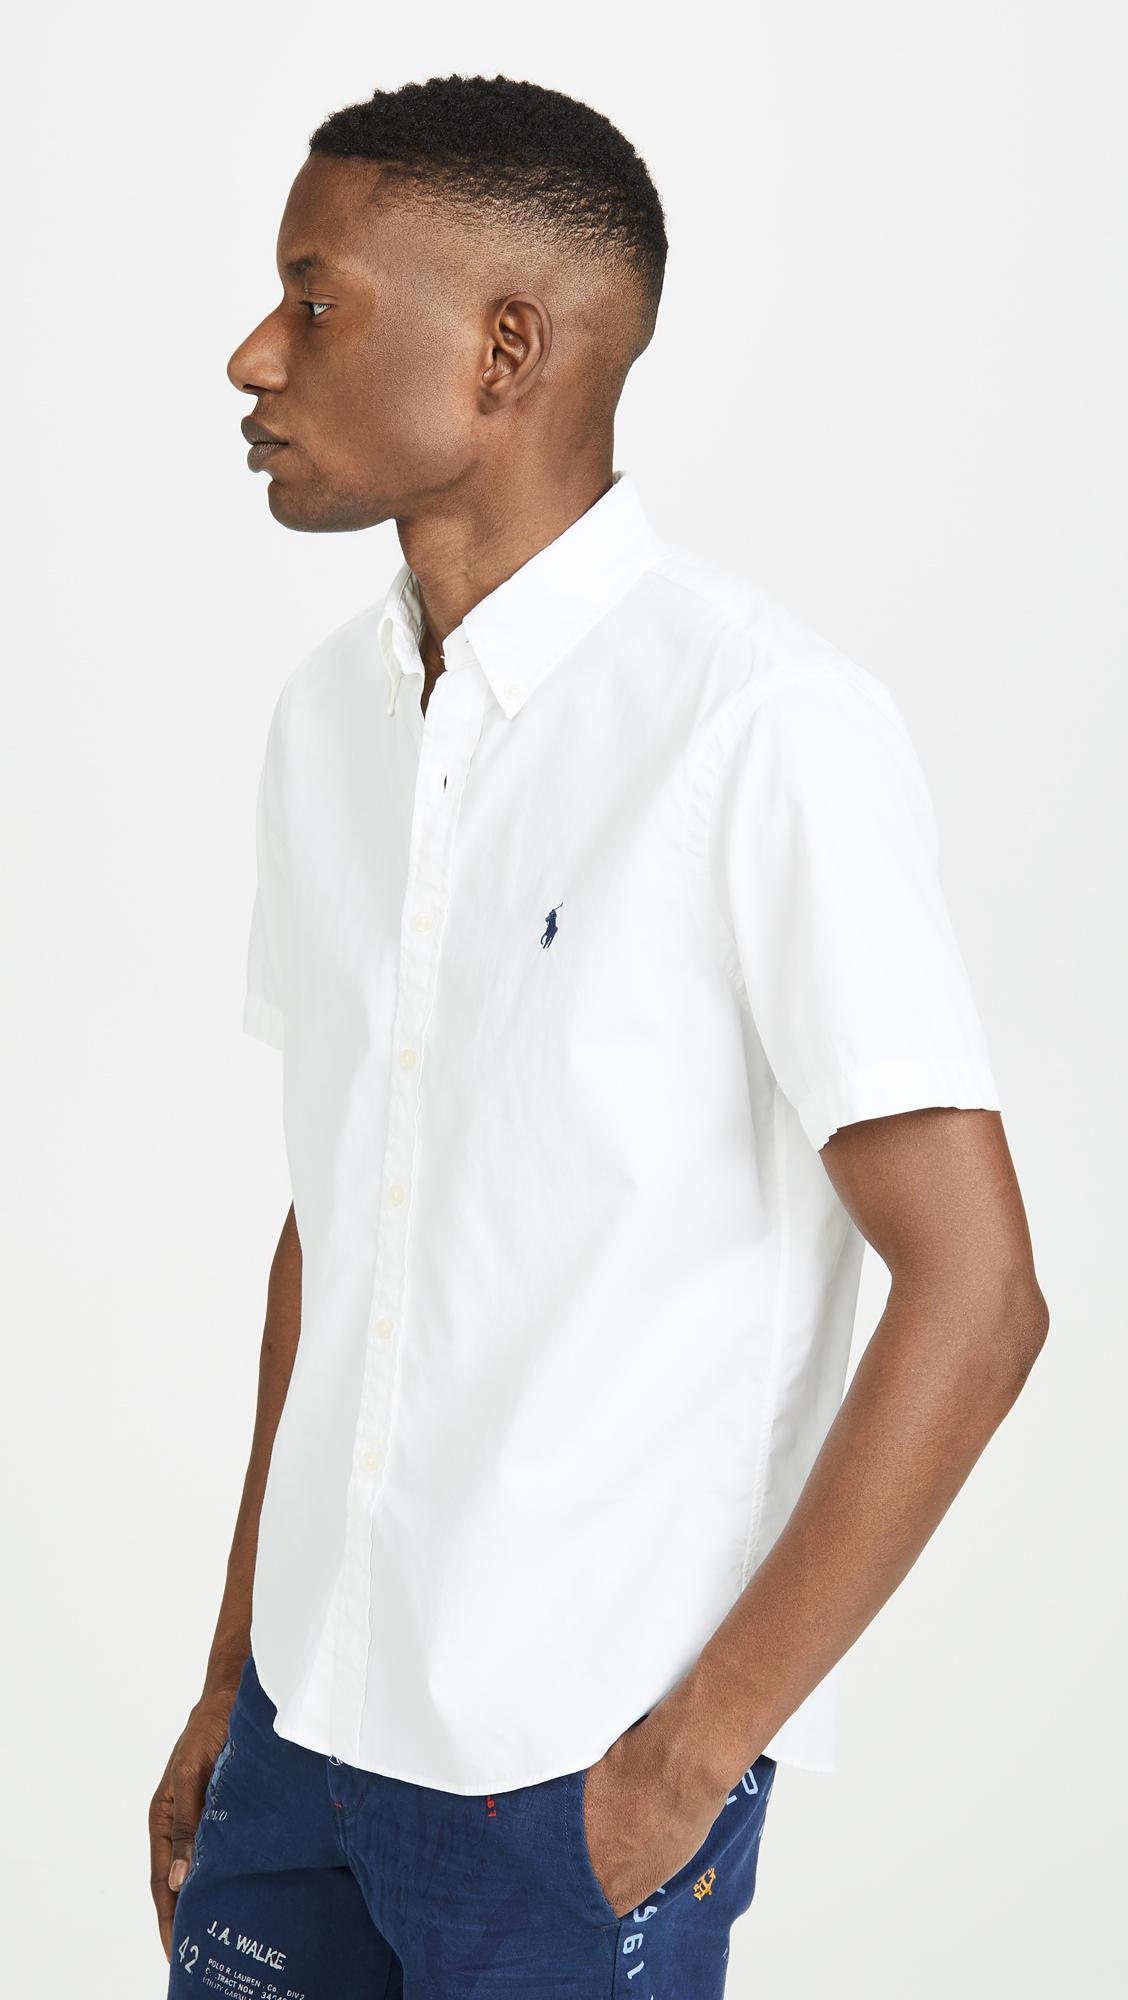 445a7f228 Polo Ralph Lauren Short Sleeve Chino Shirt